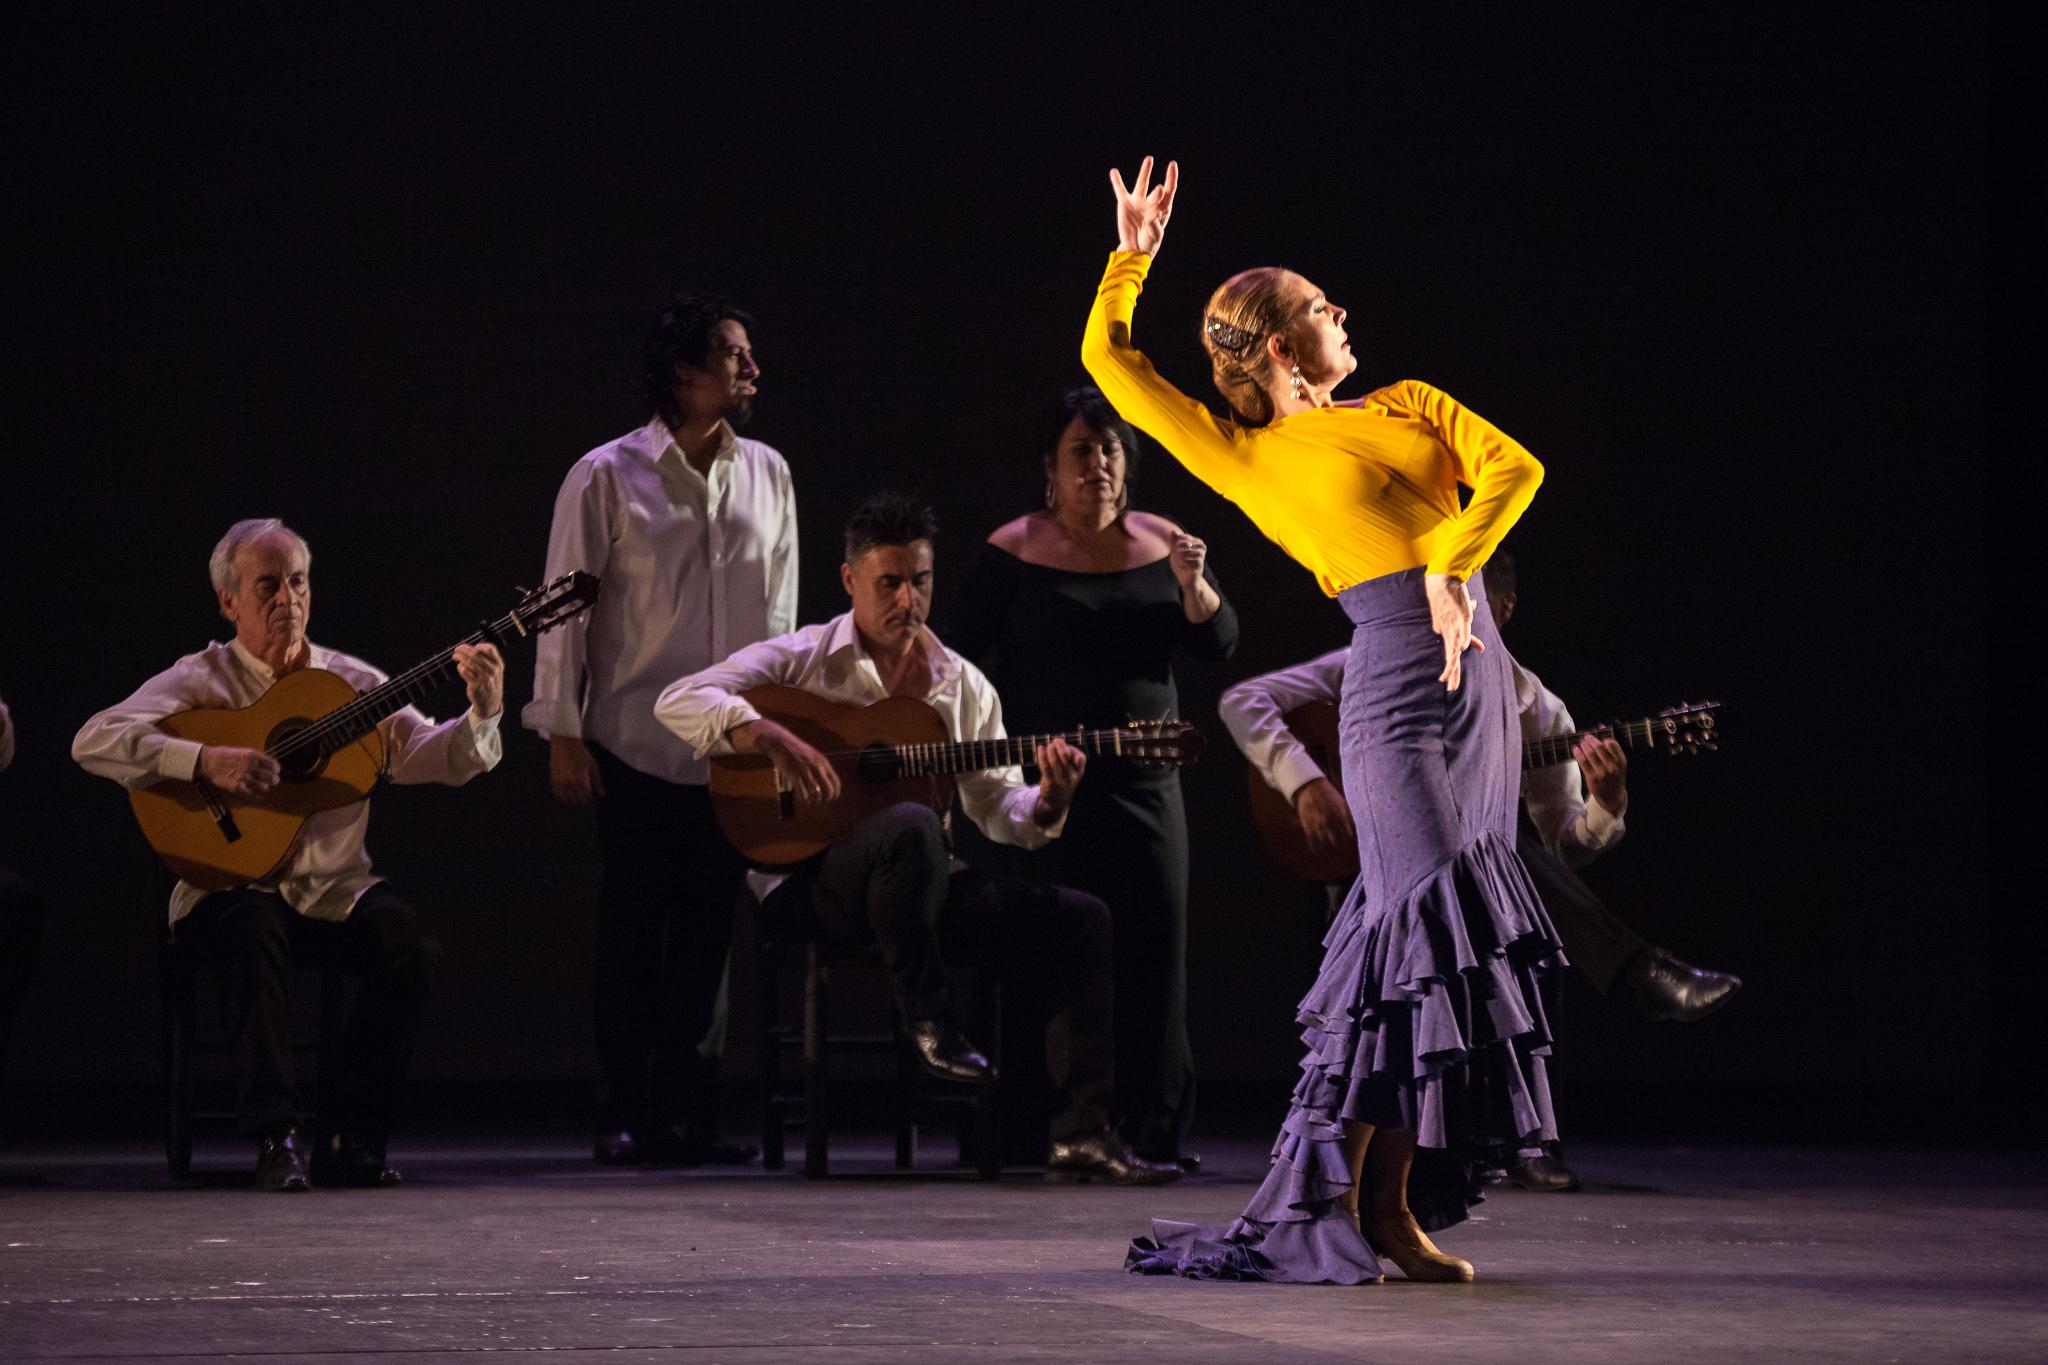 dance photography, fotografia de escena, fotografo de danza, dance photographer, stage photography